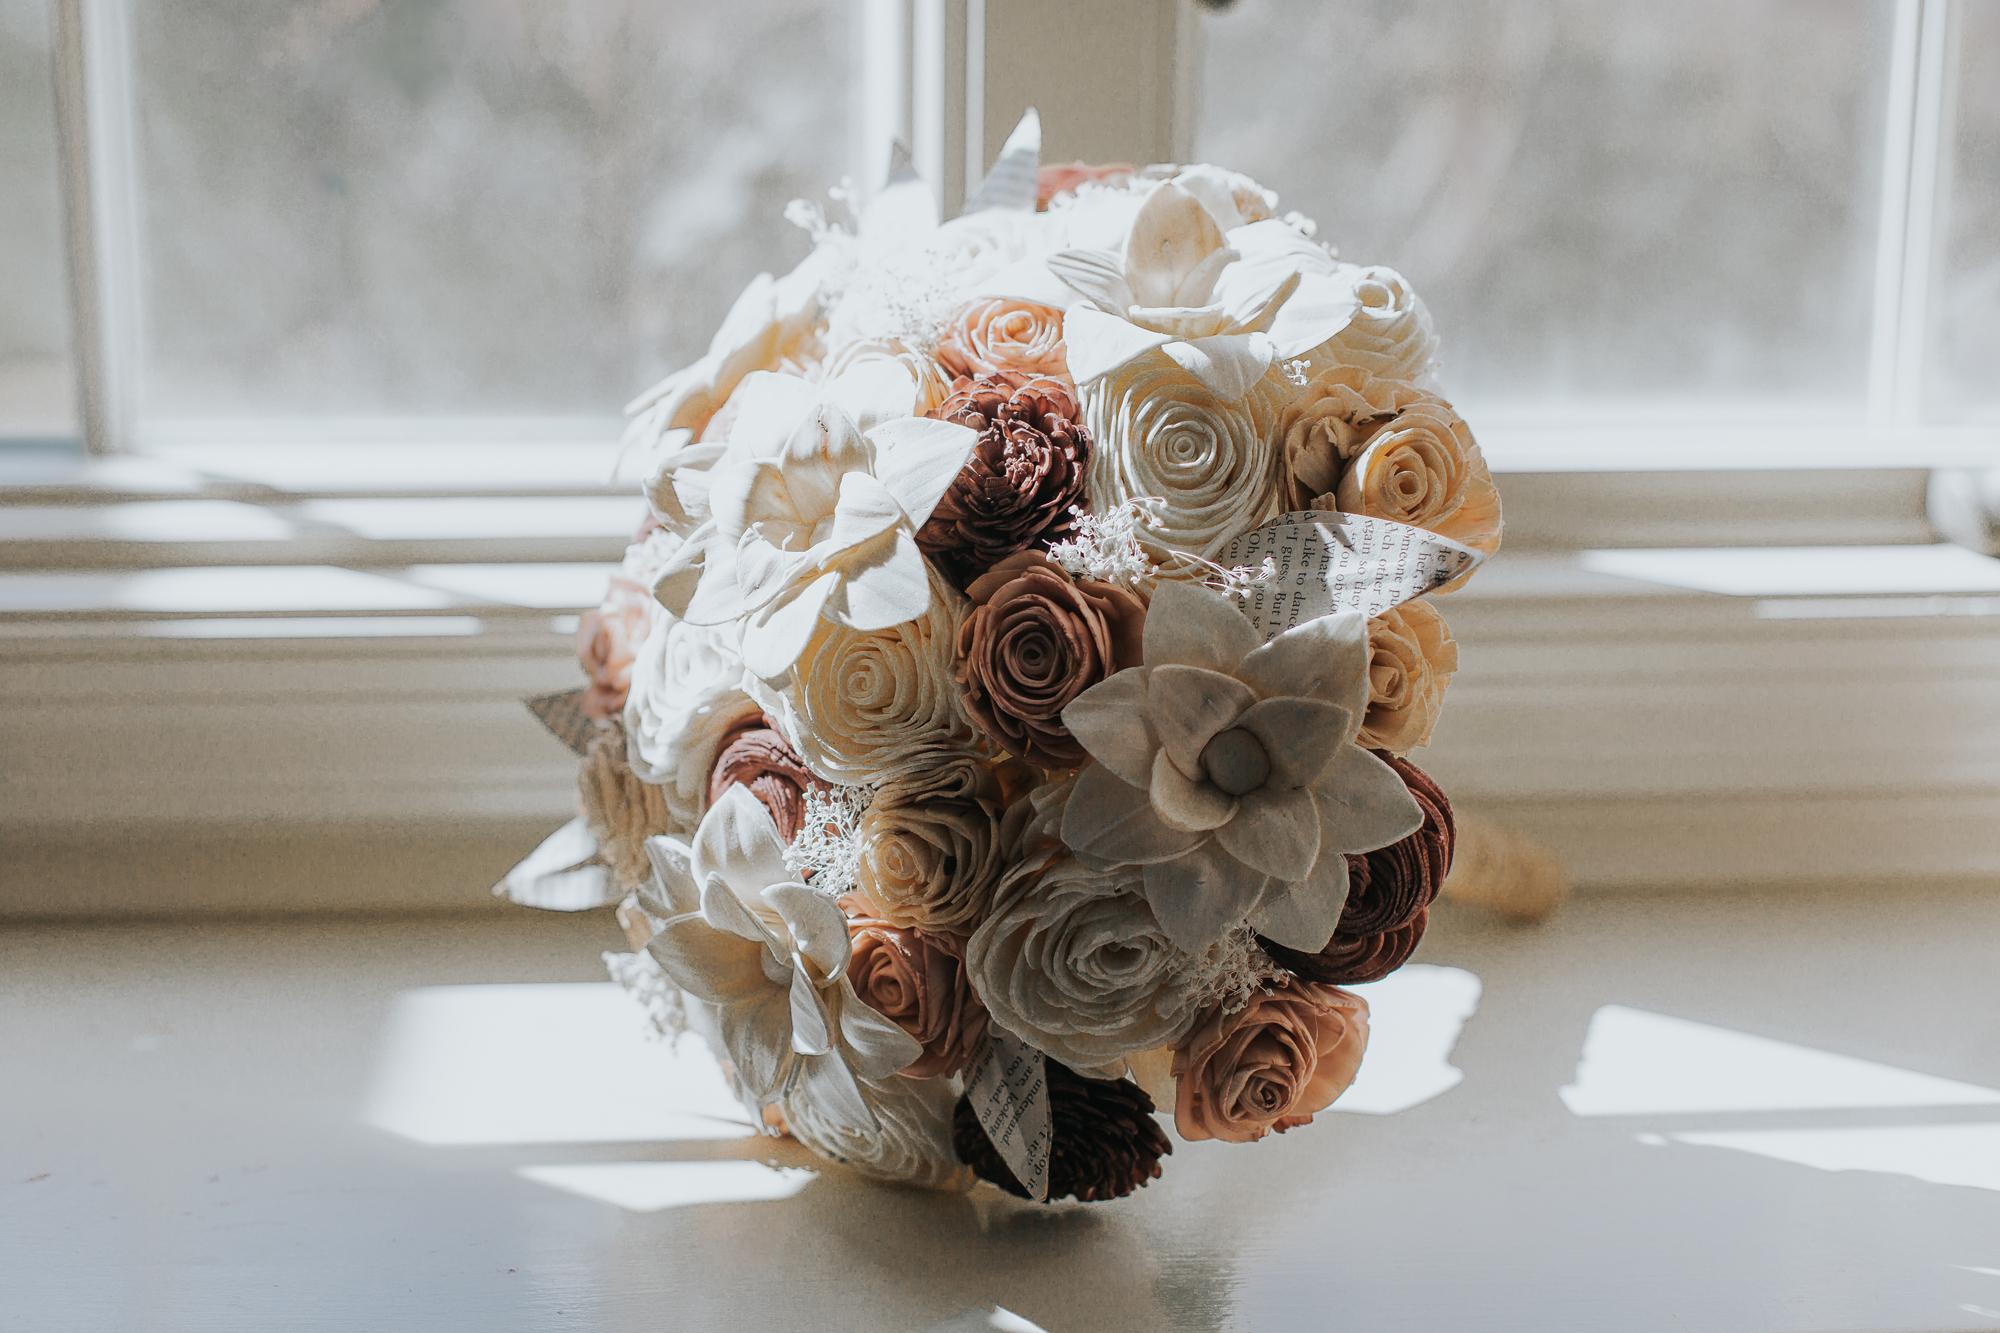 wood-flower-bouquet-wedding-day-decor-photography